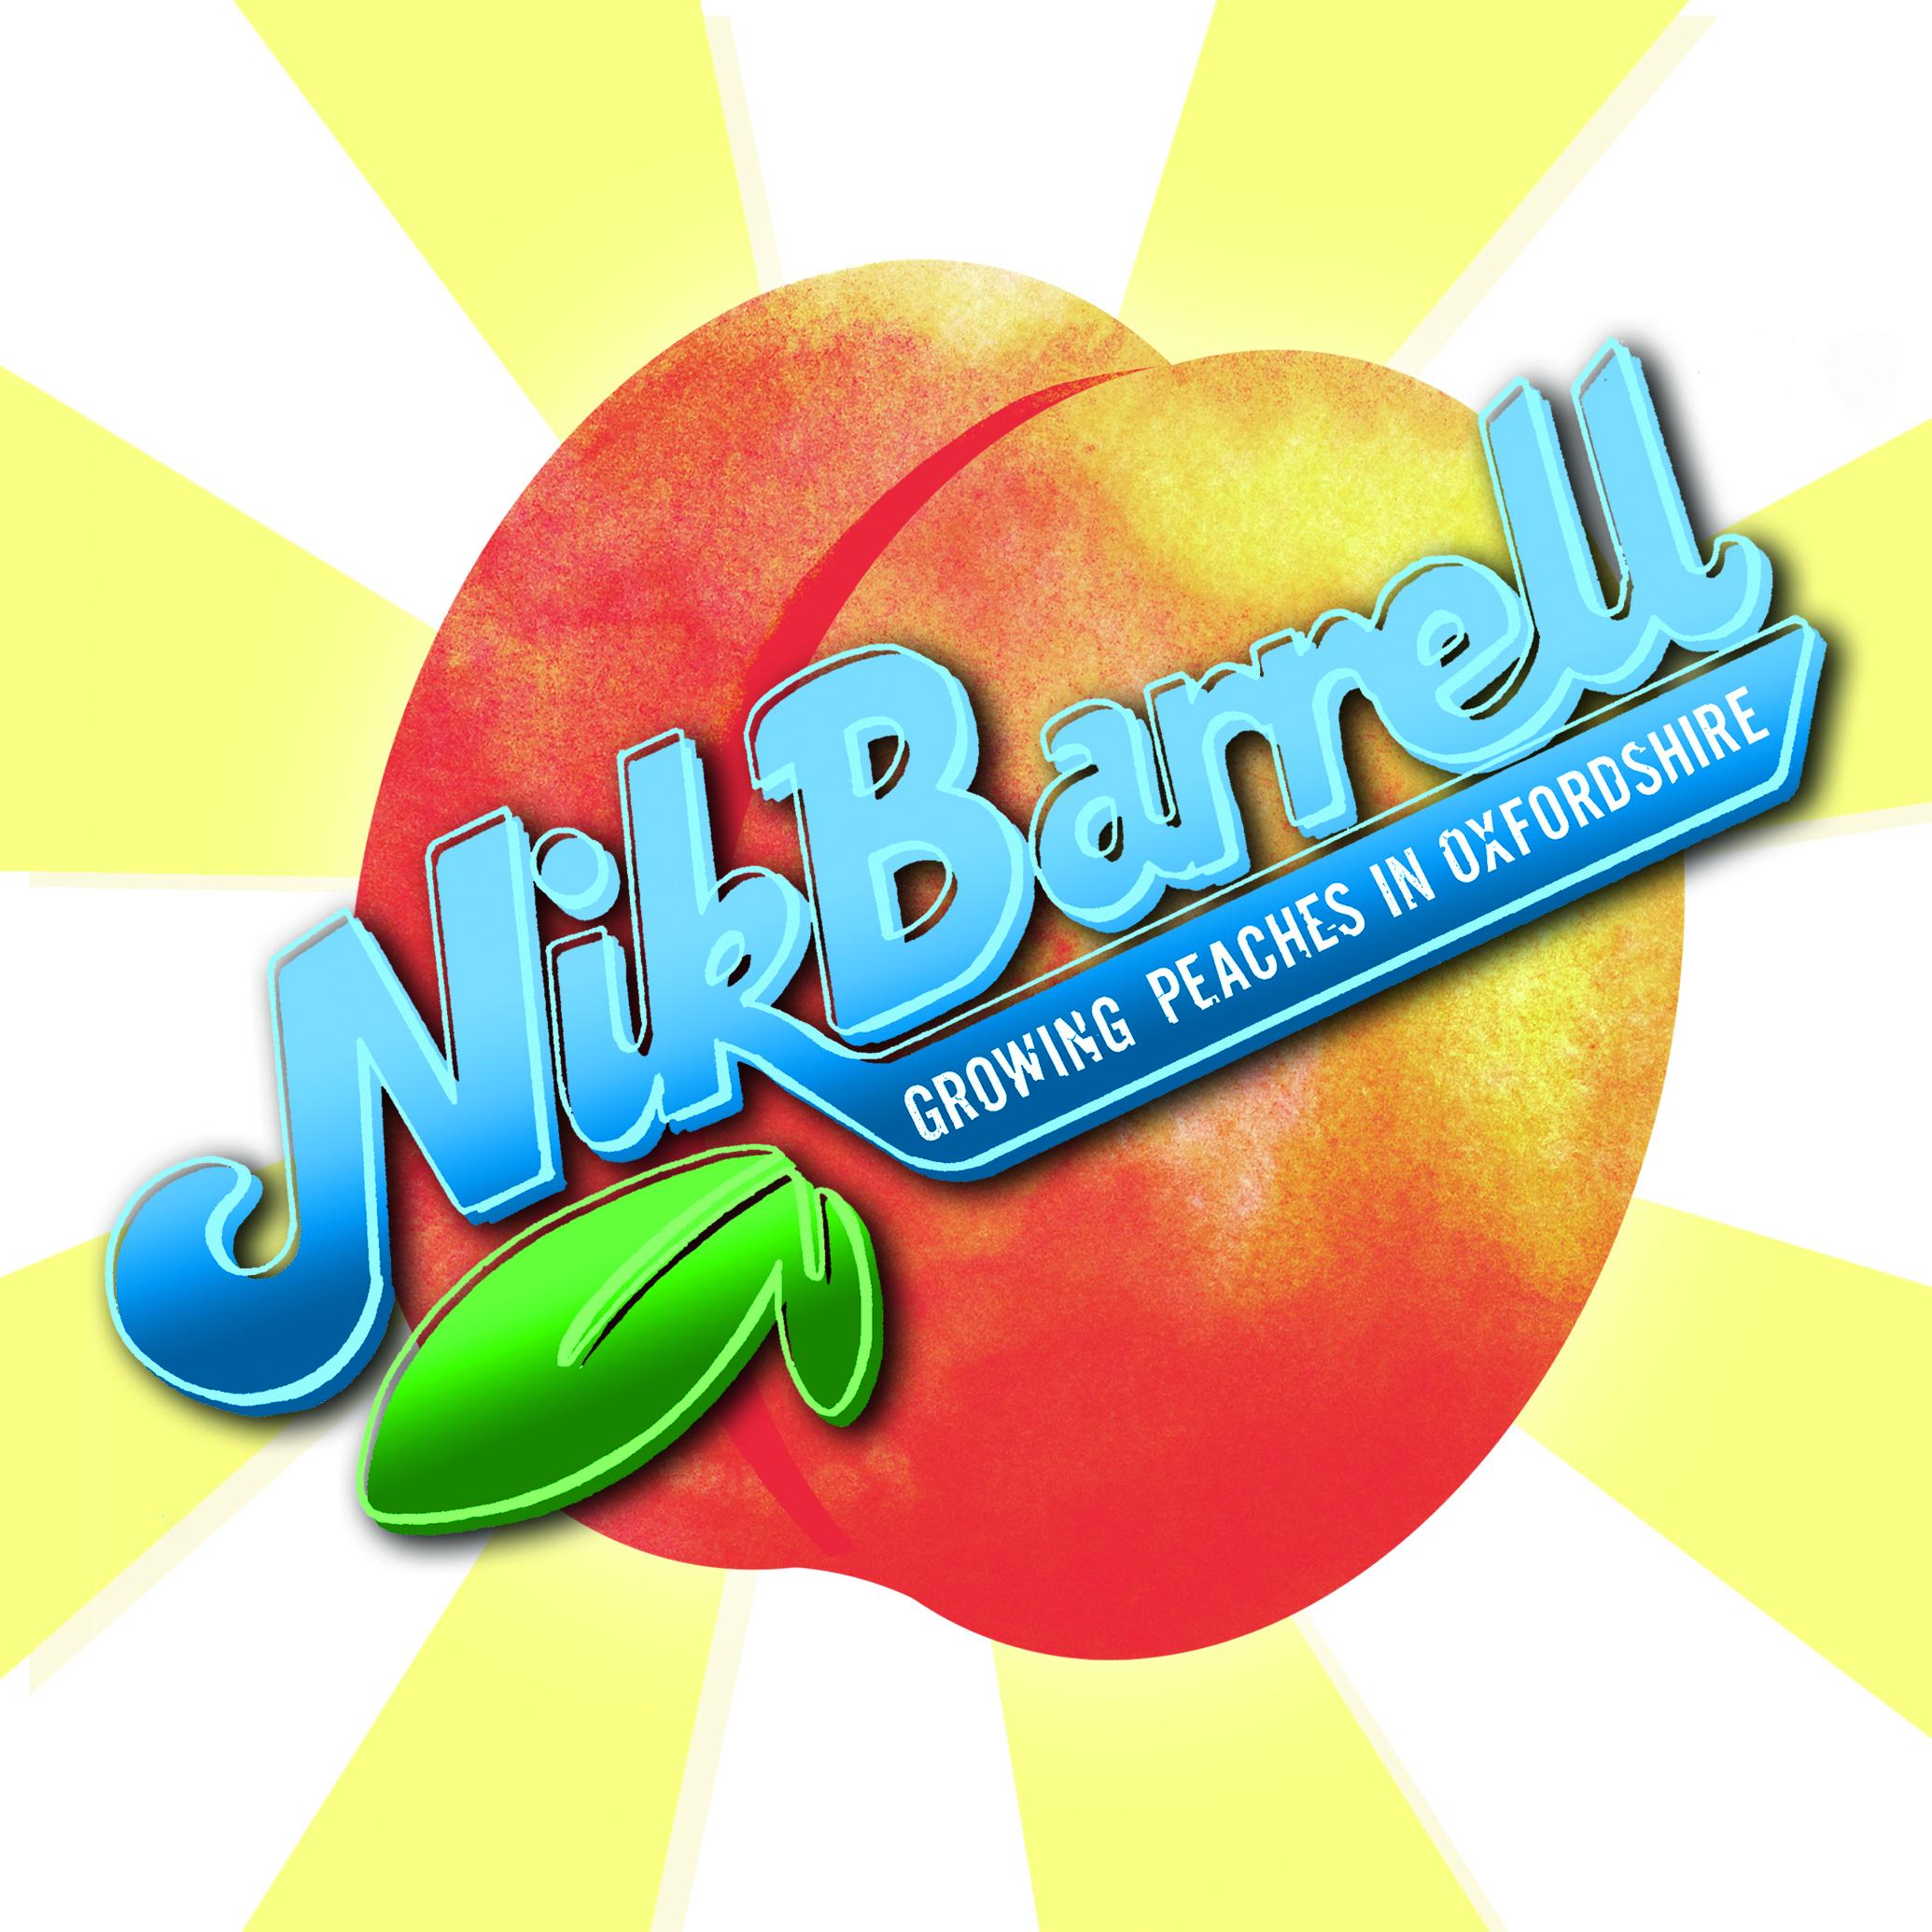 Nik Barrell